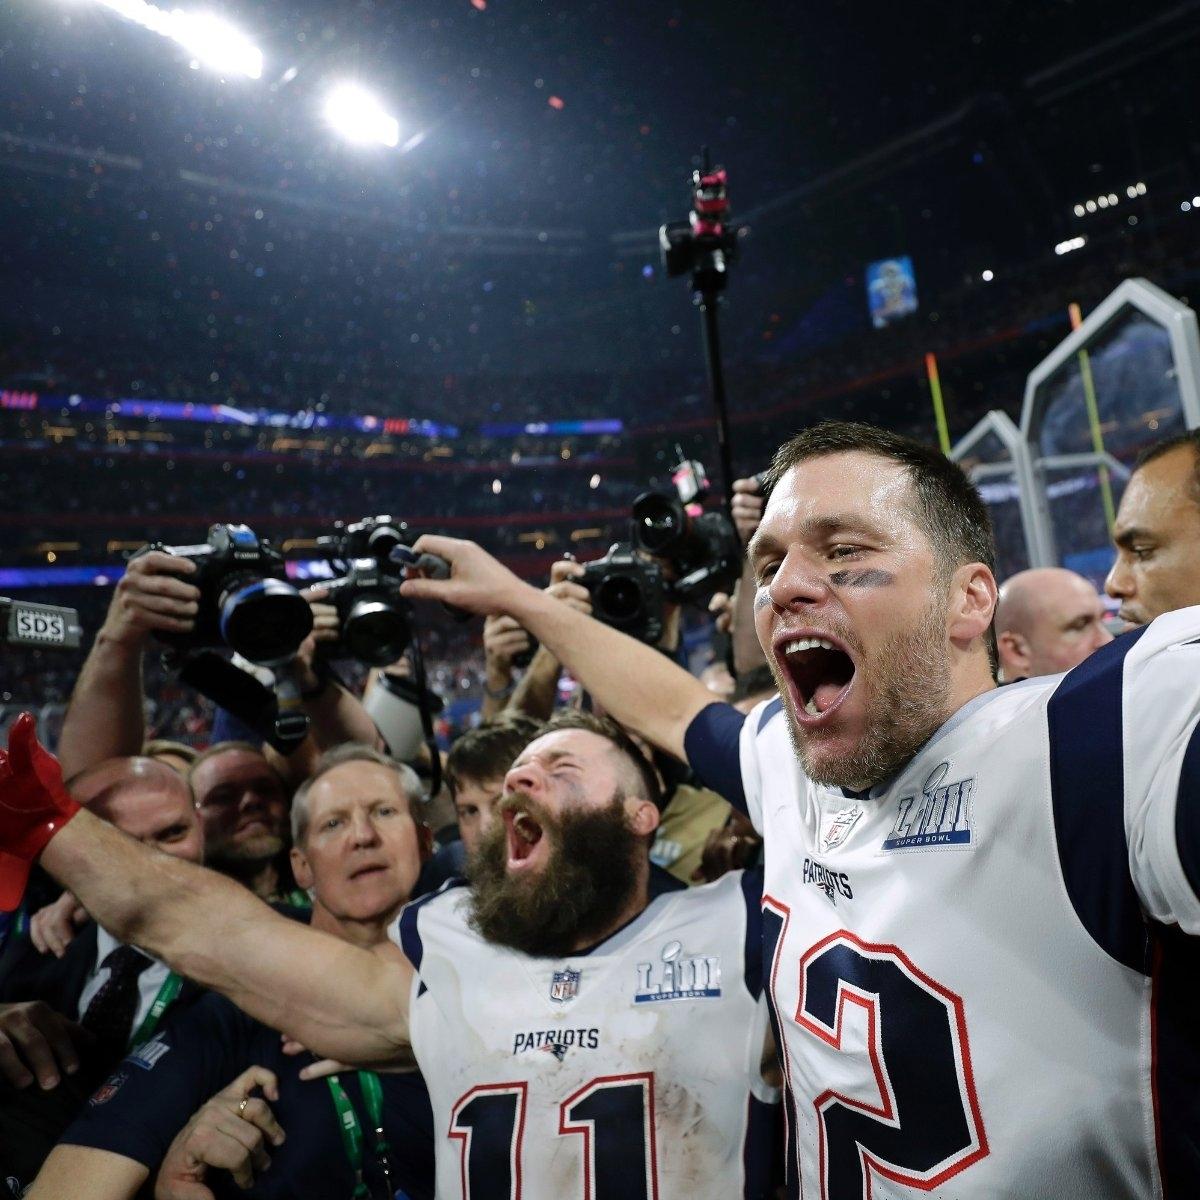 Super Bowl 2019: New England Patriots Schlagen Los Angeles in Super Bowl 53 Mvp Voting